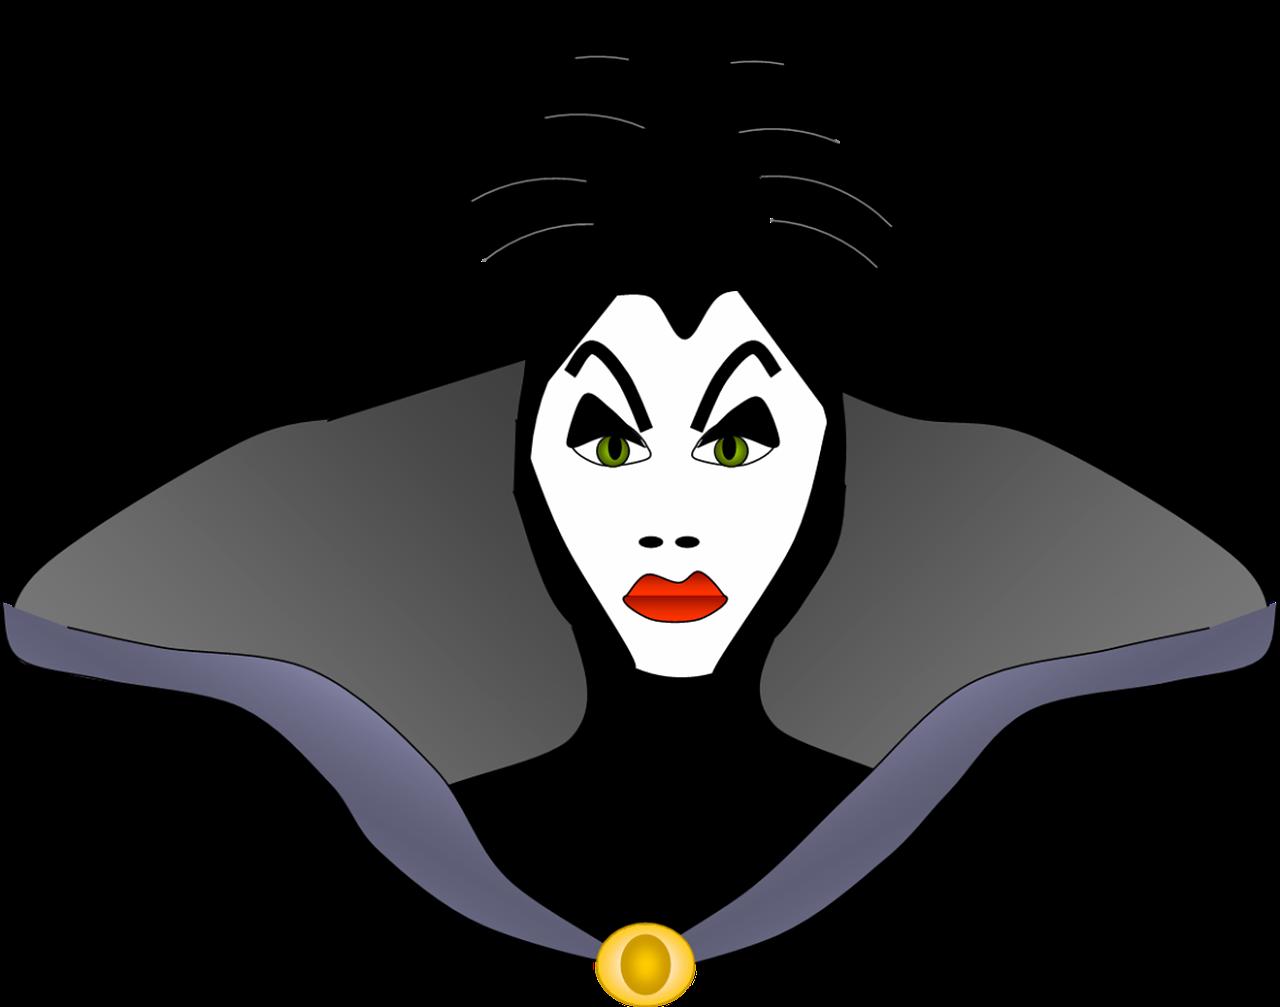 Maleficent Characters Cartoon Free Image On Pixabay